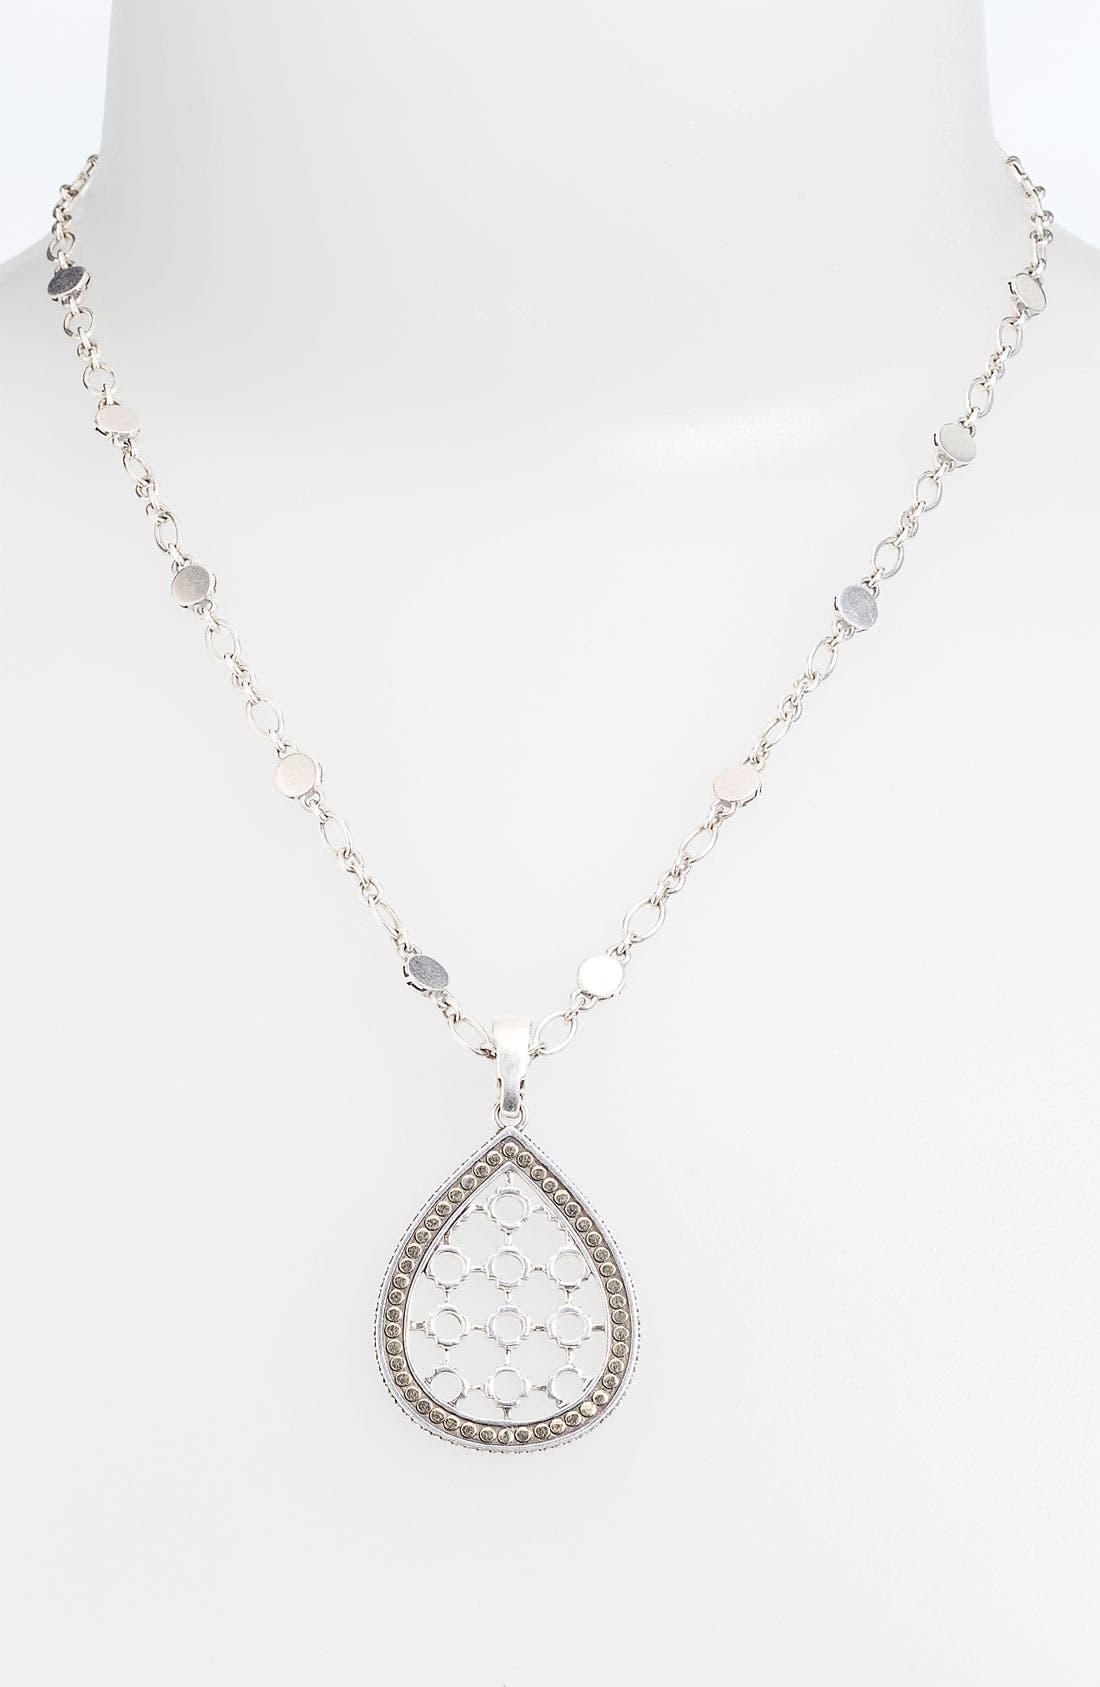 Main Image - John Hardy 'Dot' Pendant Necklace